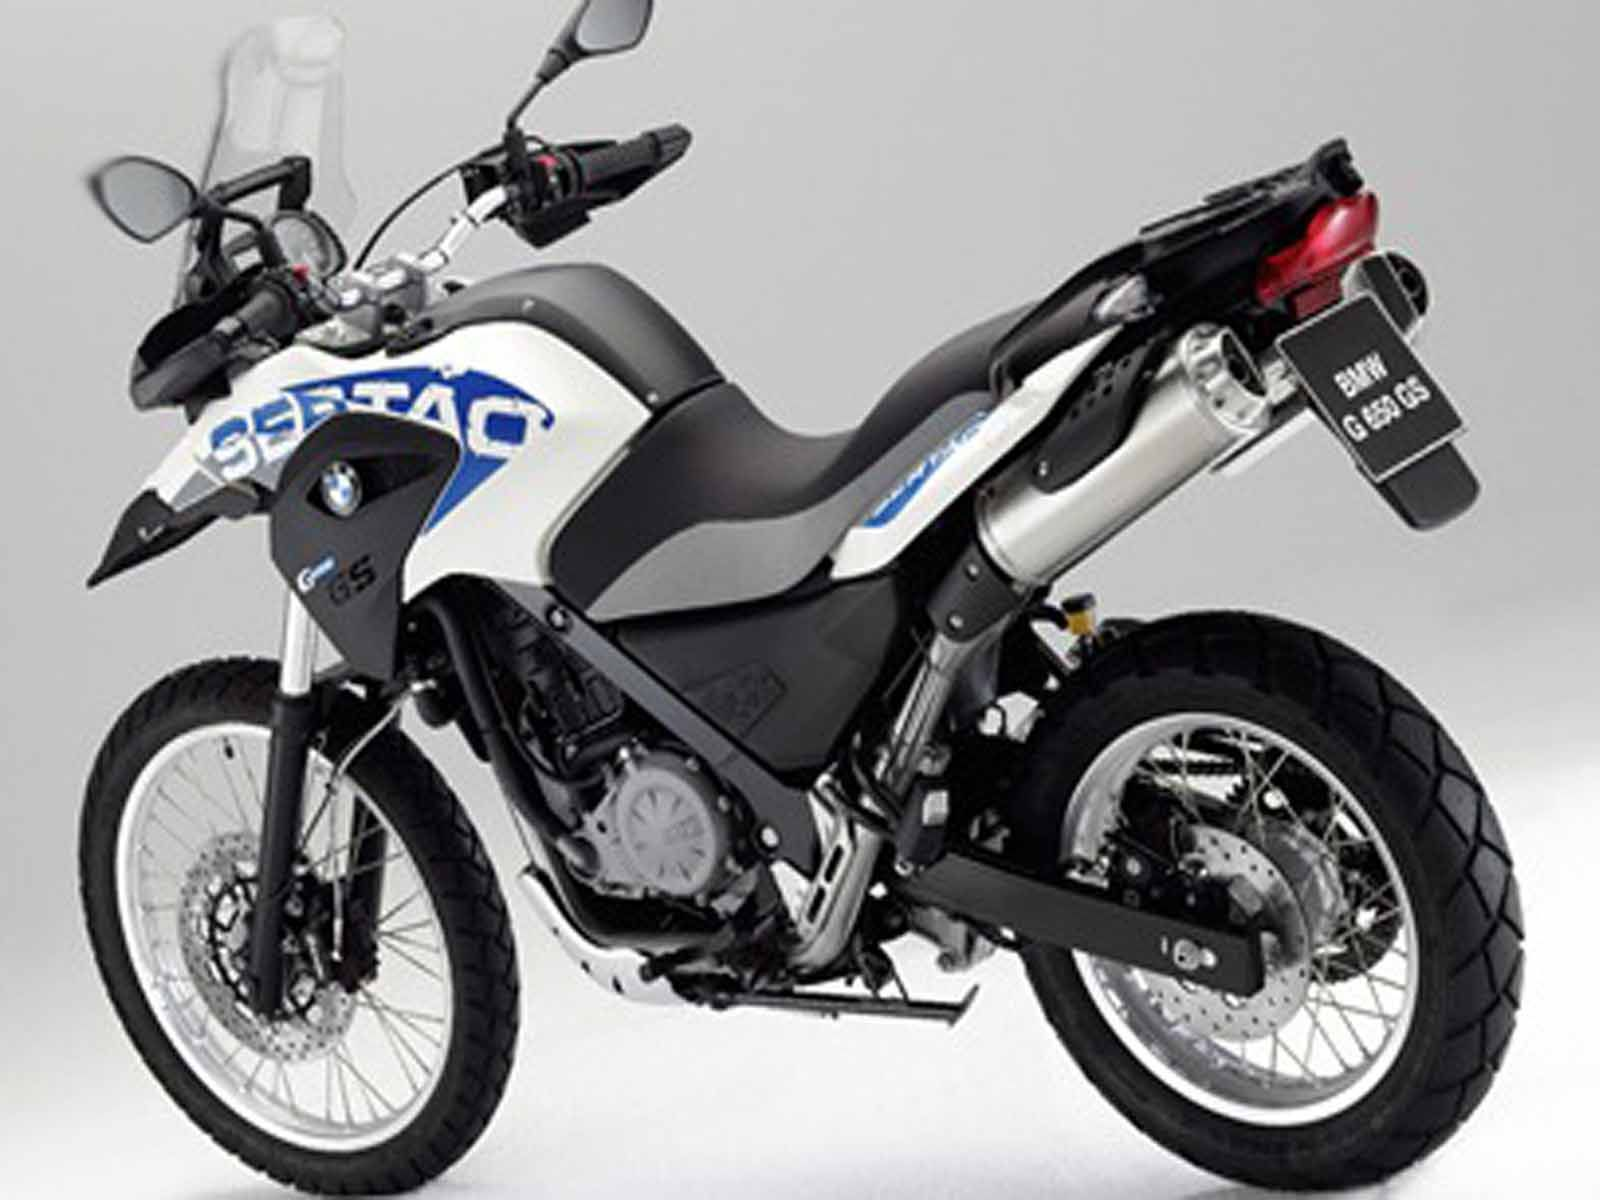 Bmw G 650 Gs Sertao 08 Bmw 650 Hd Images Bmw Motorcycle Bike